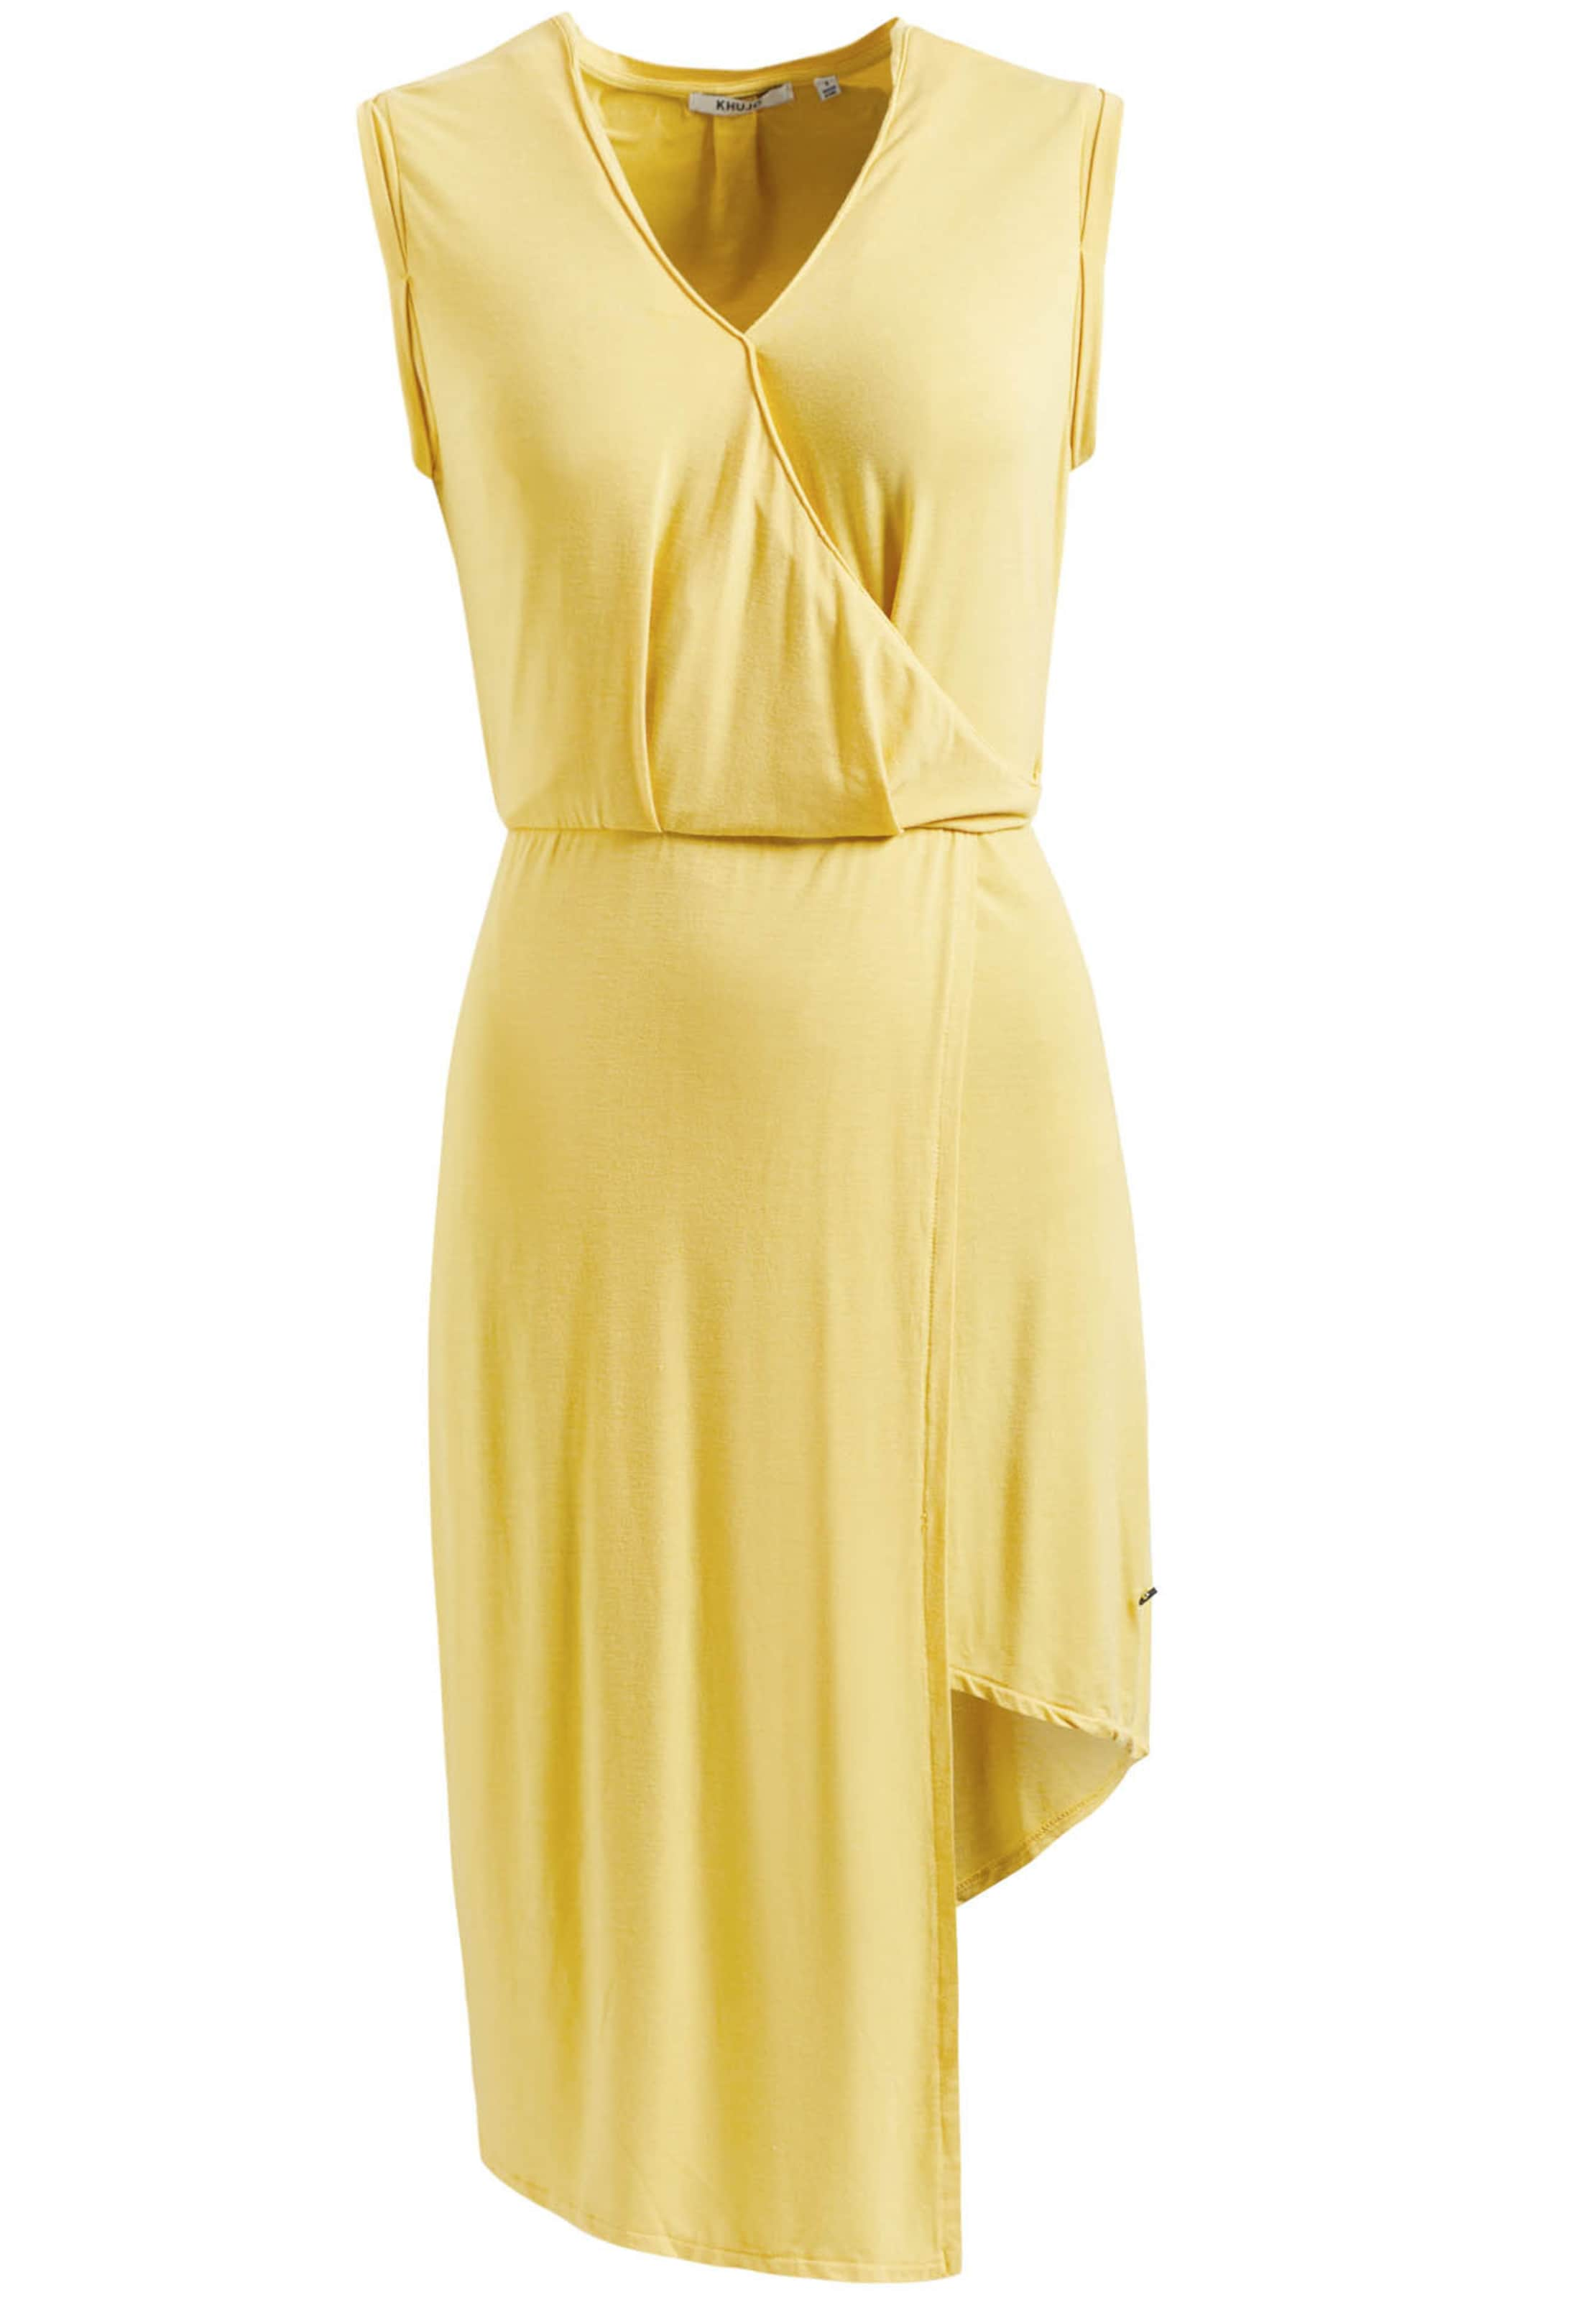 In 'aurelia' Khujo 'aurelia' Kleid In Gelb Kleid Khujo Kleid Khujo Gelb xsQrChtd